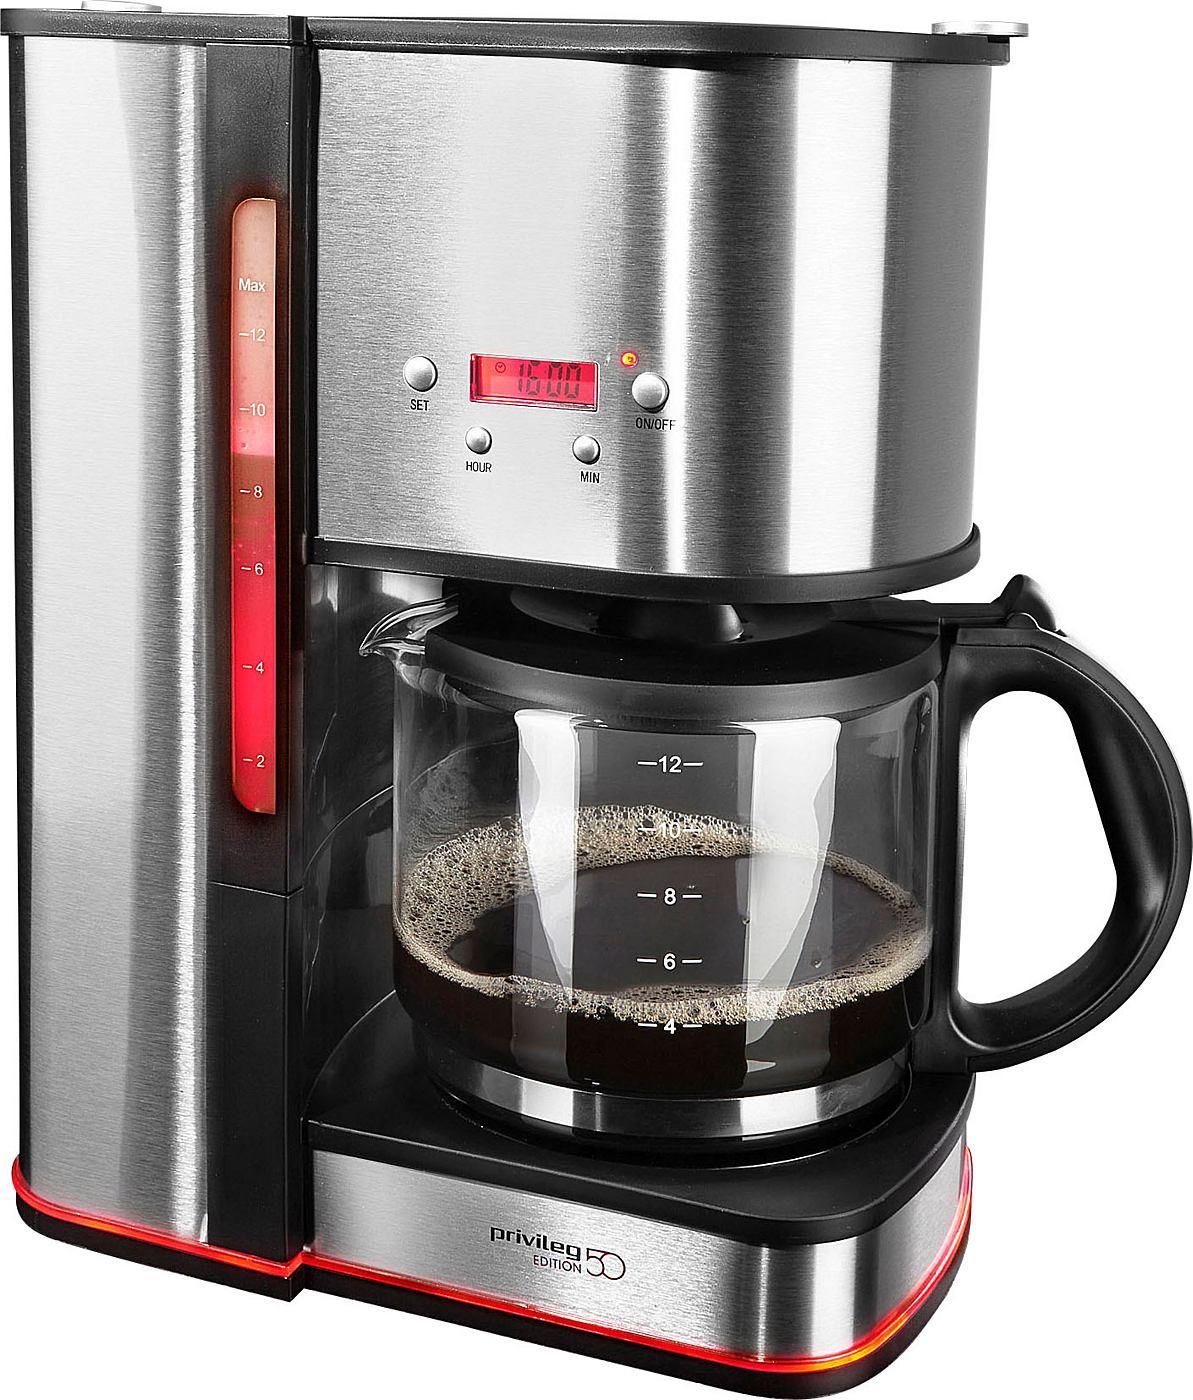 Privileg Kaffeemaschine Edition 50